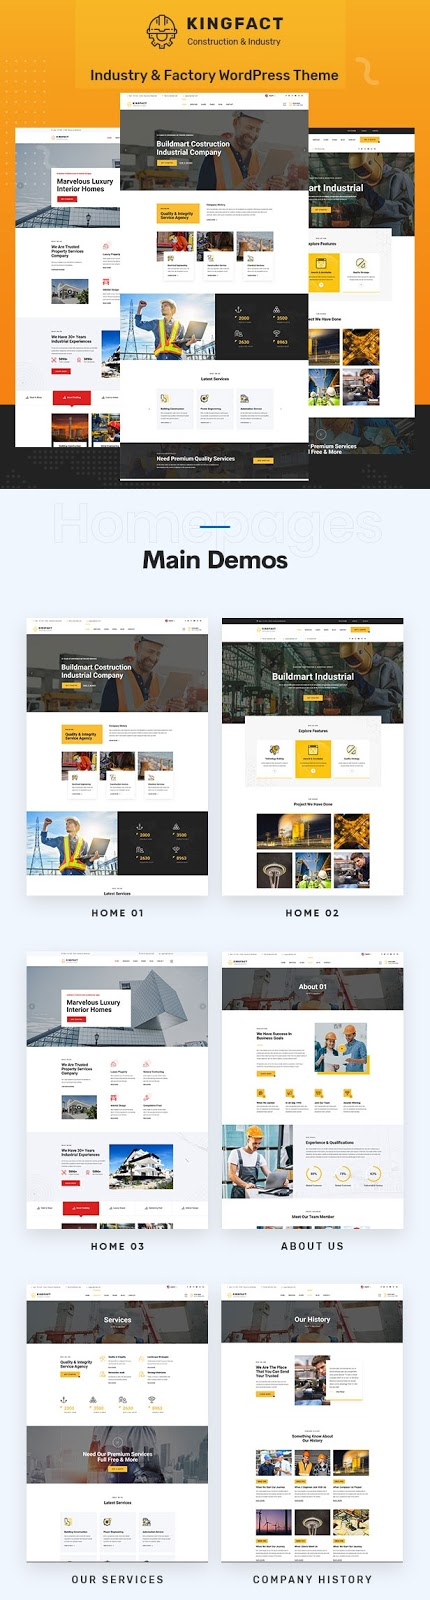 Best Industry & Factory WordPress Template